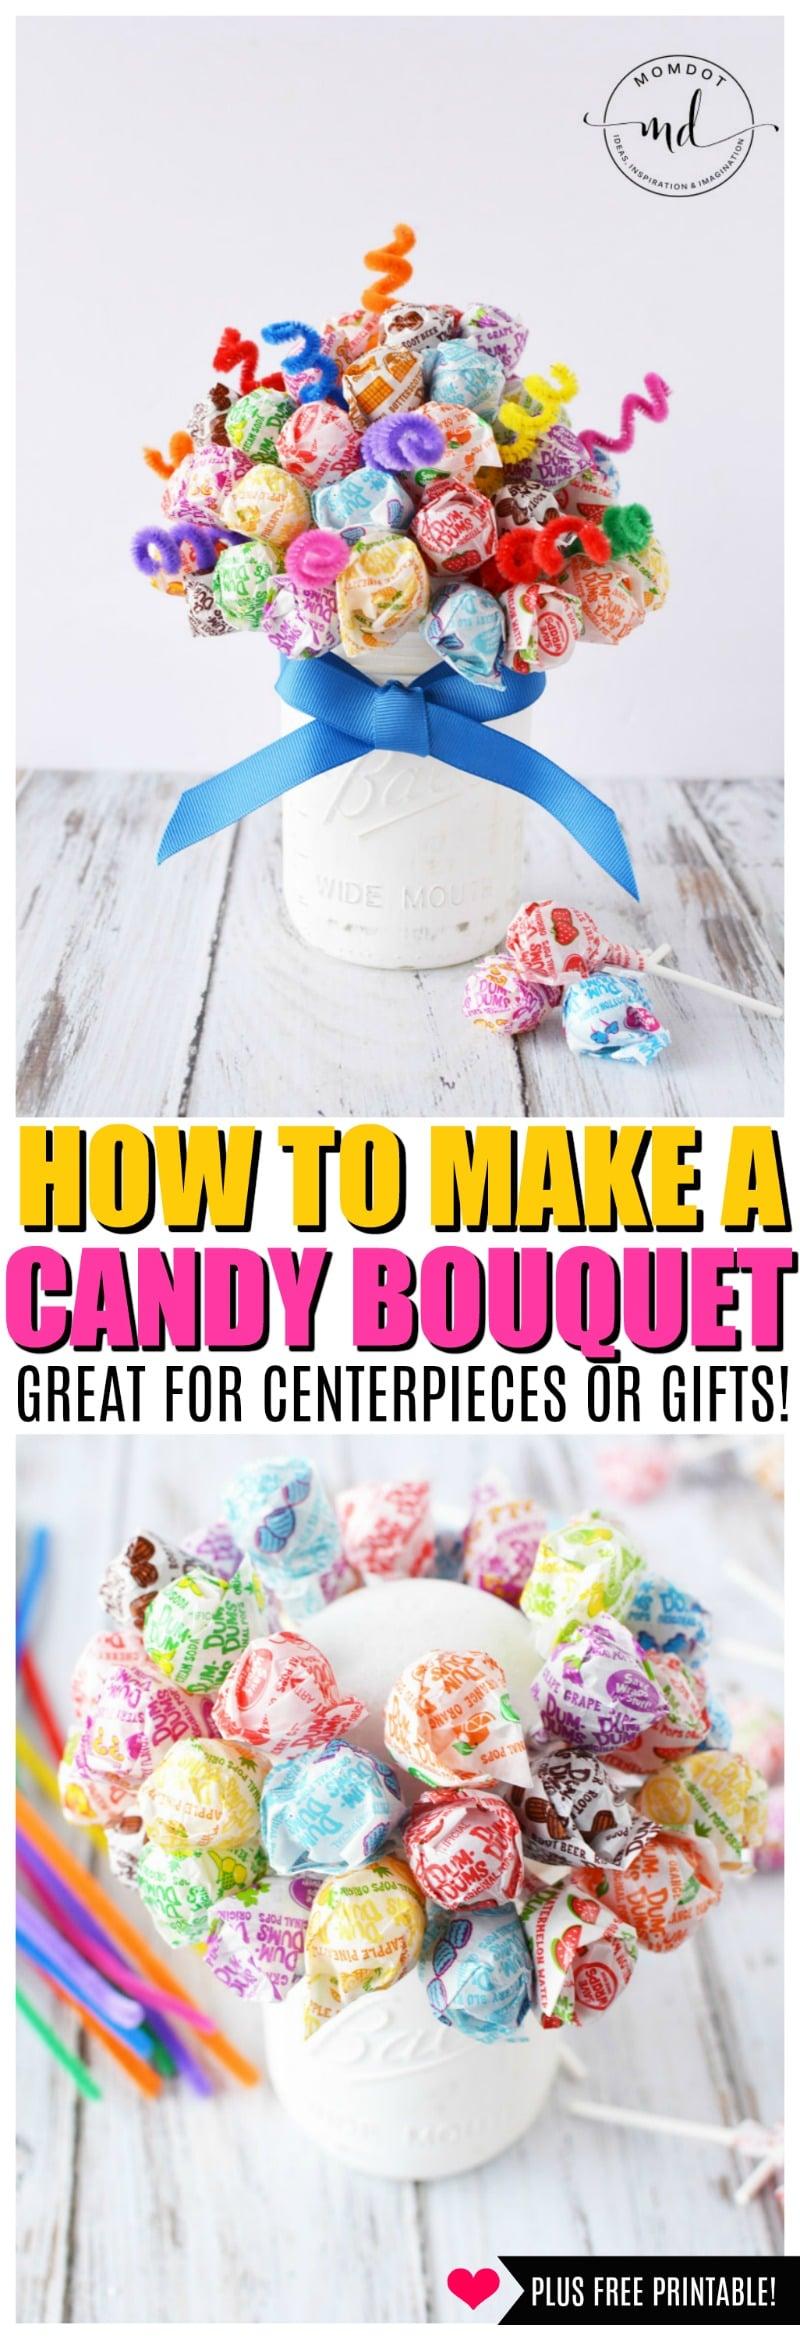 DIY candy bouquet instructions